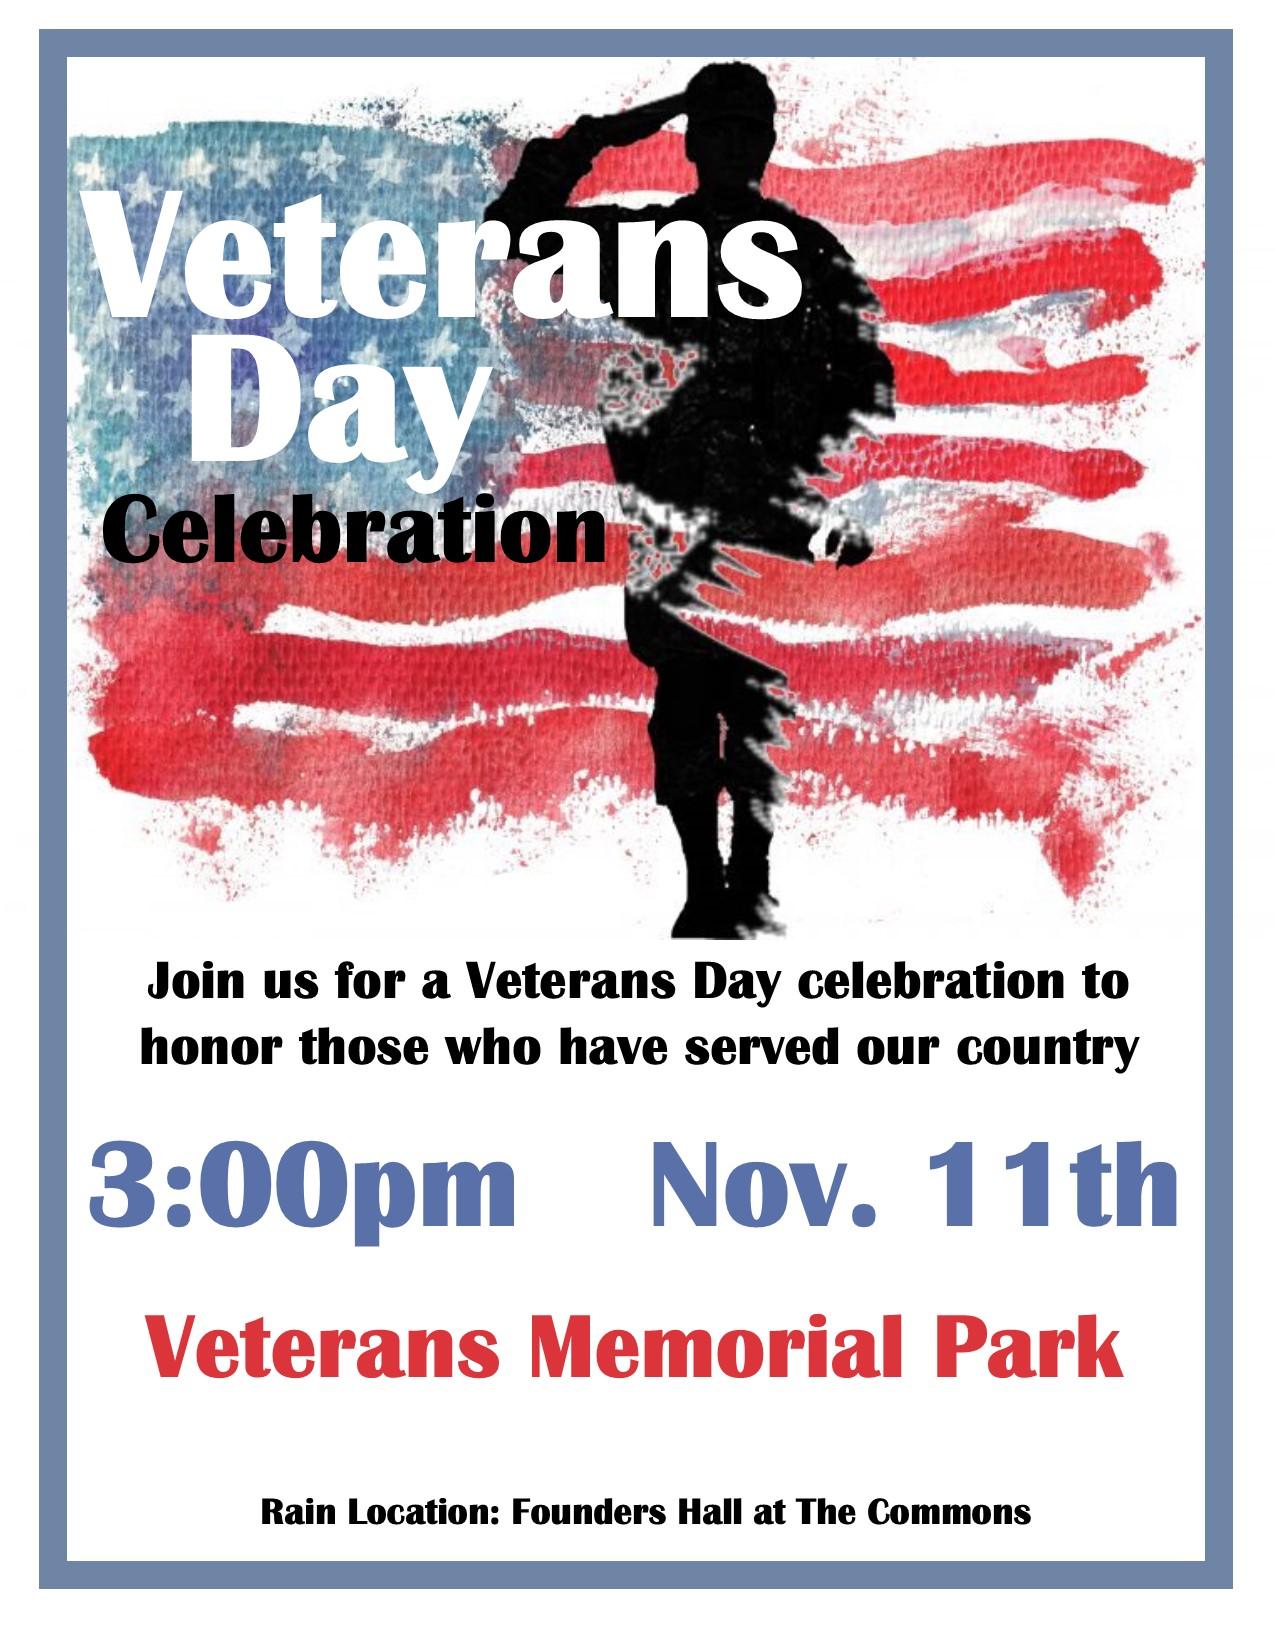 veteransdaycelebration2020